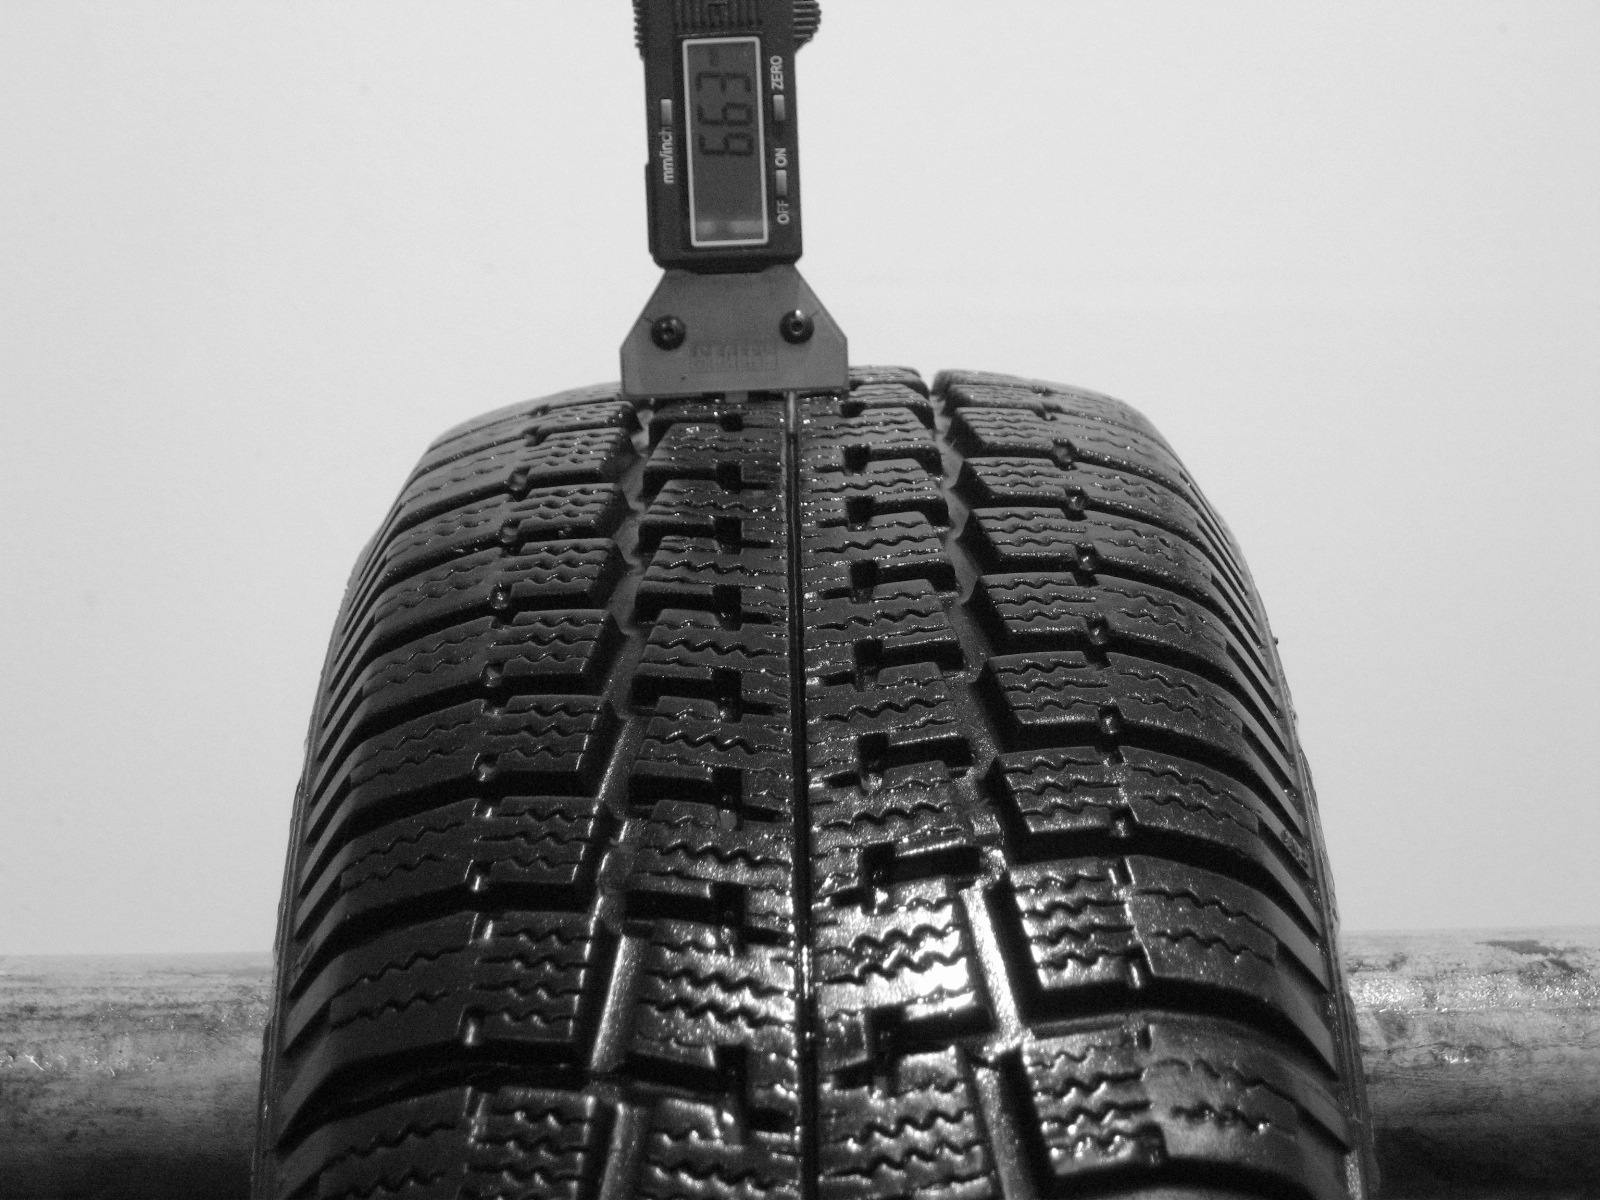 Použité-Pneu-Bazar - 185/65 R14 PIRELLI WINTER 190 DIREZIONALE -kusovka-rezerva 3mm